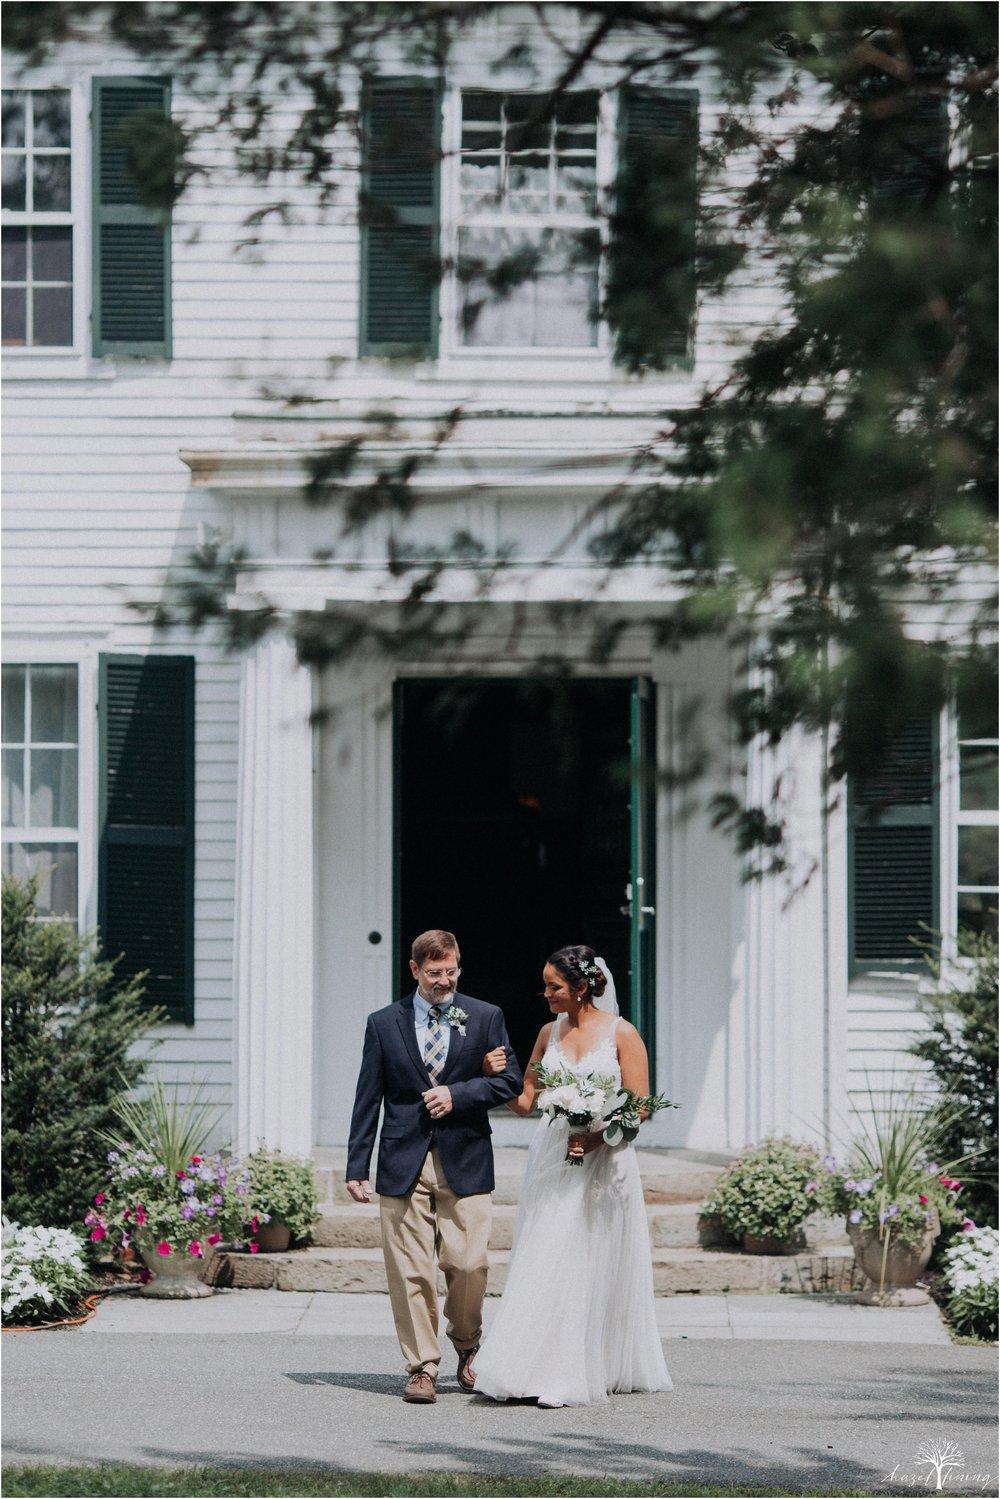 mariah-kreyling-samuel-sherratt-sherrattwiththeworld-peirce-farm-at-witch-hill-boston-massachusetts-wedding-photography-hazel-lining-travel-wedding-elopement-photography_0075.jpg